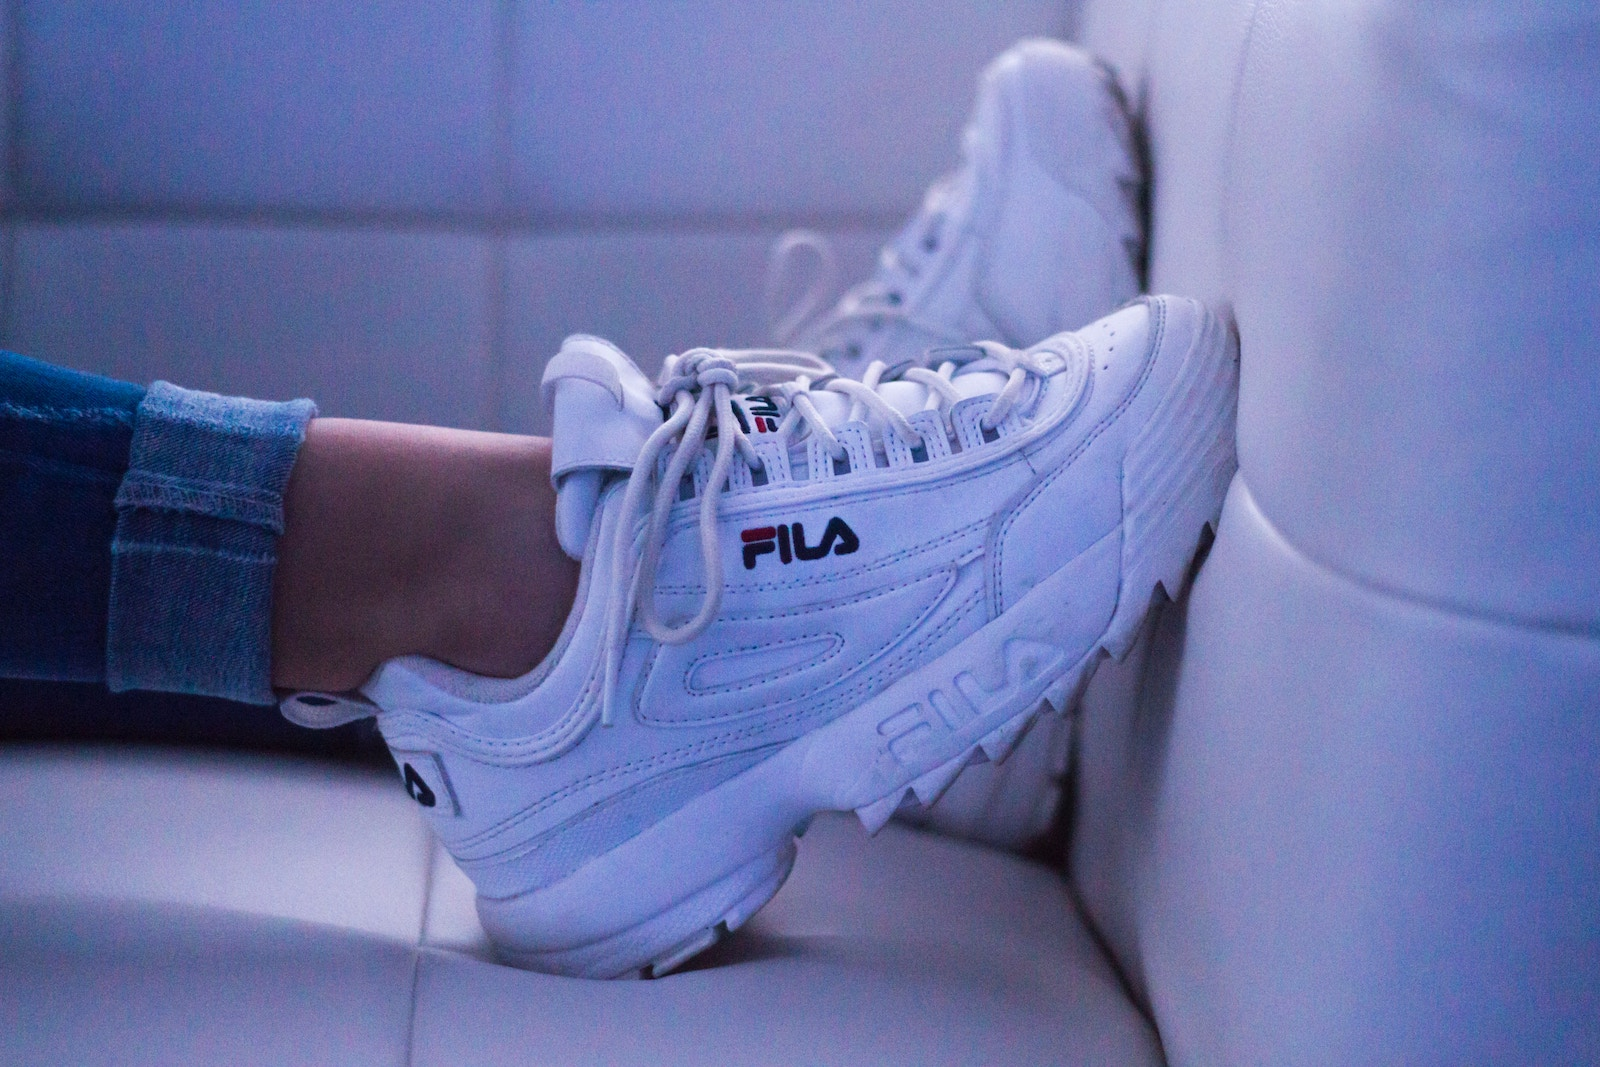 Fila Disrupt co będzie modne wiosna lato 2019 trendy ugly sneakers dad shoes